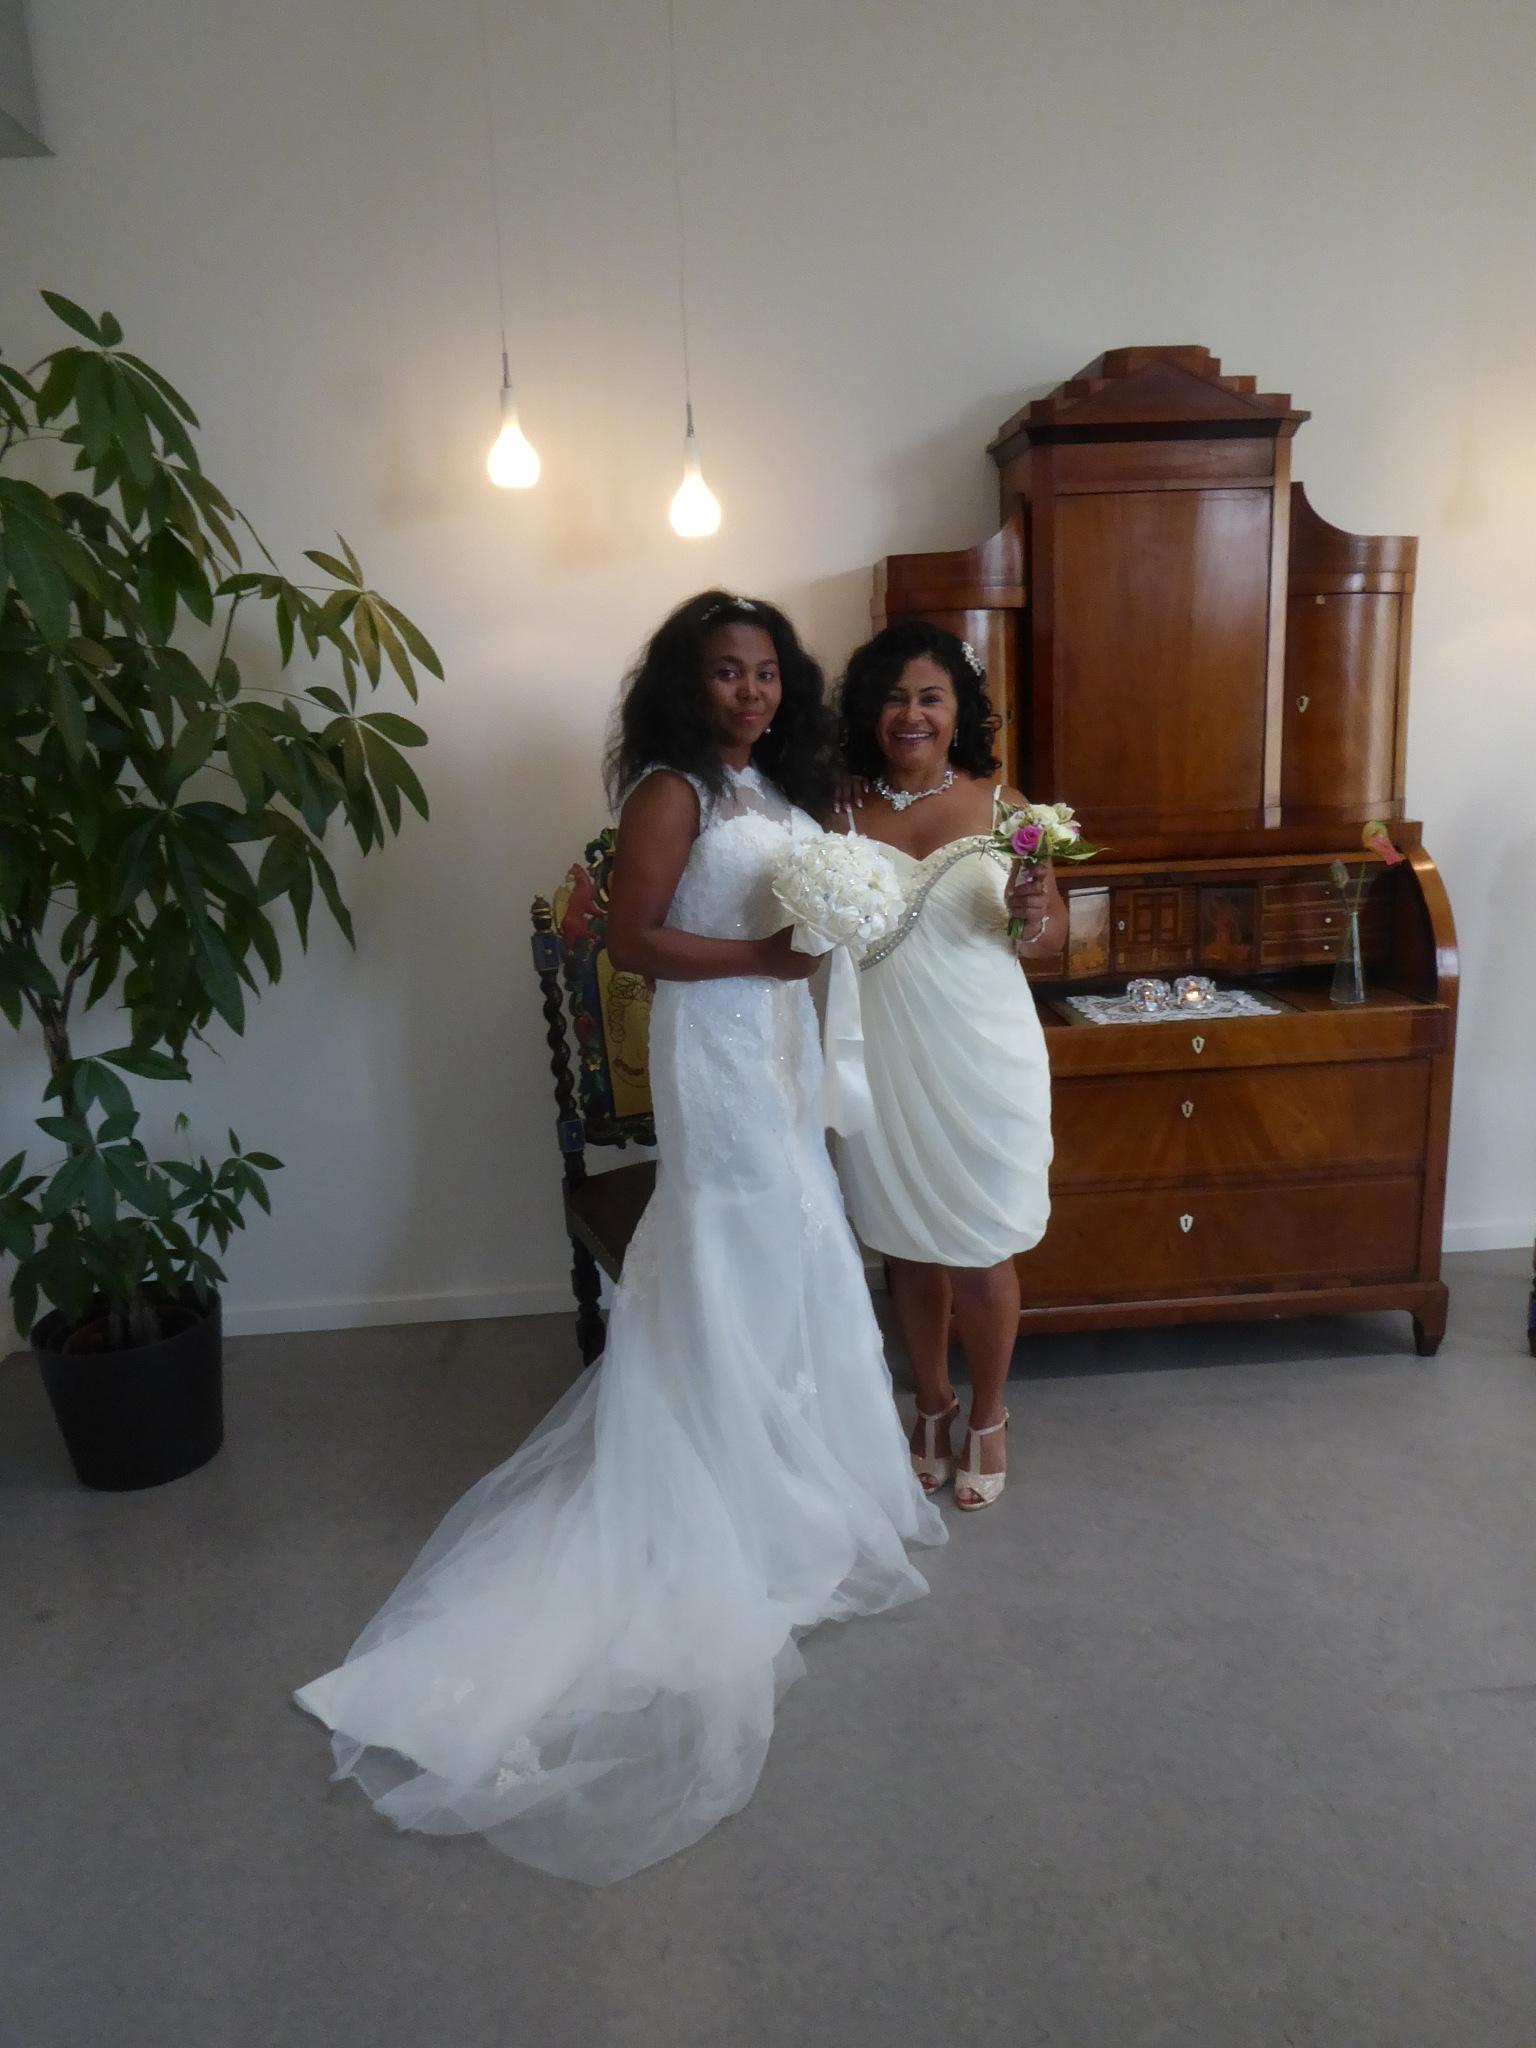 2 brides  by Norbert Reiss